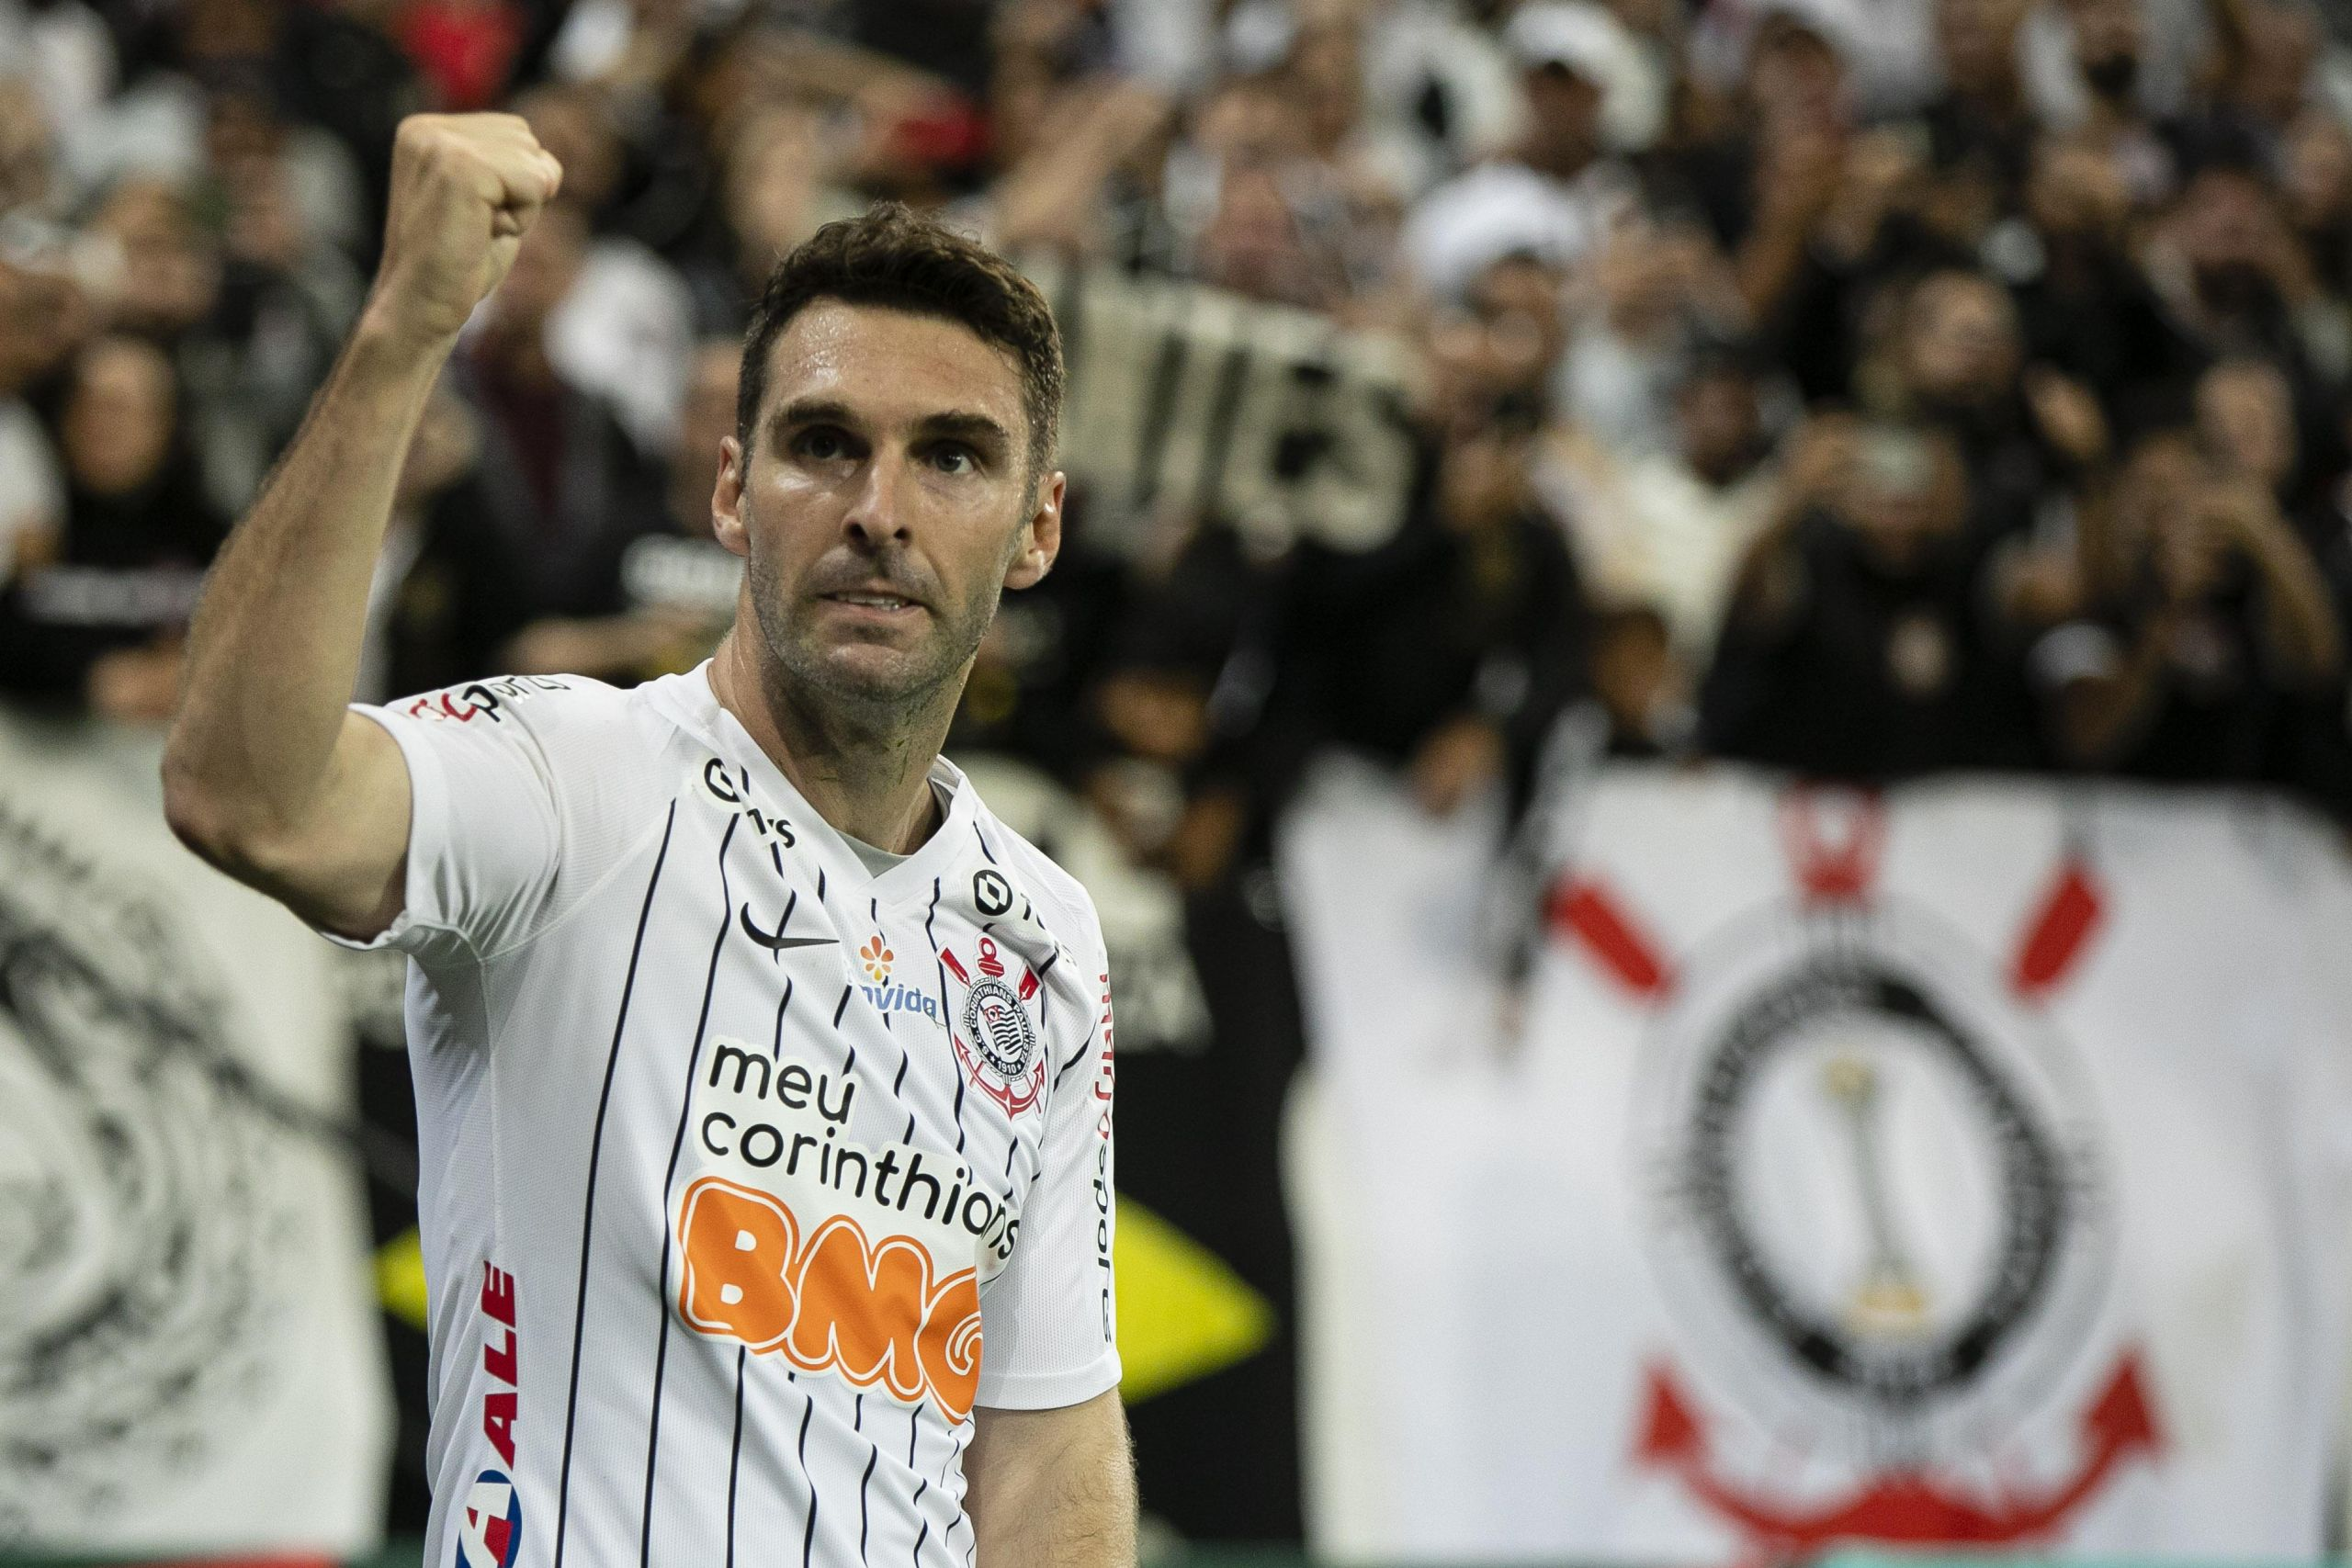 Boselli - Corinthians 4 x 1 Botafogo